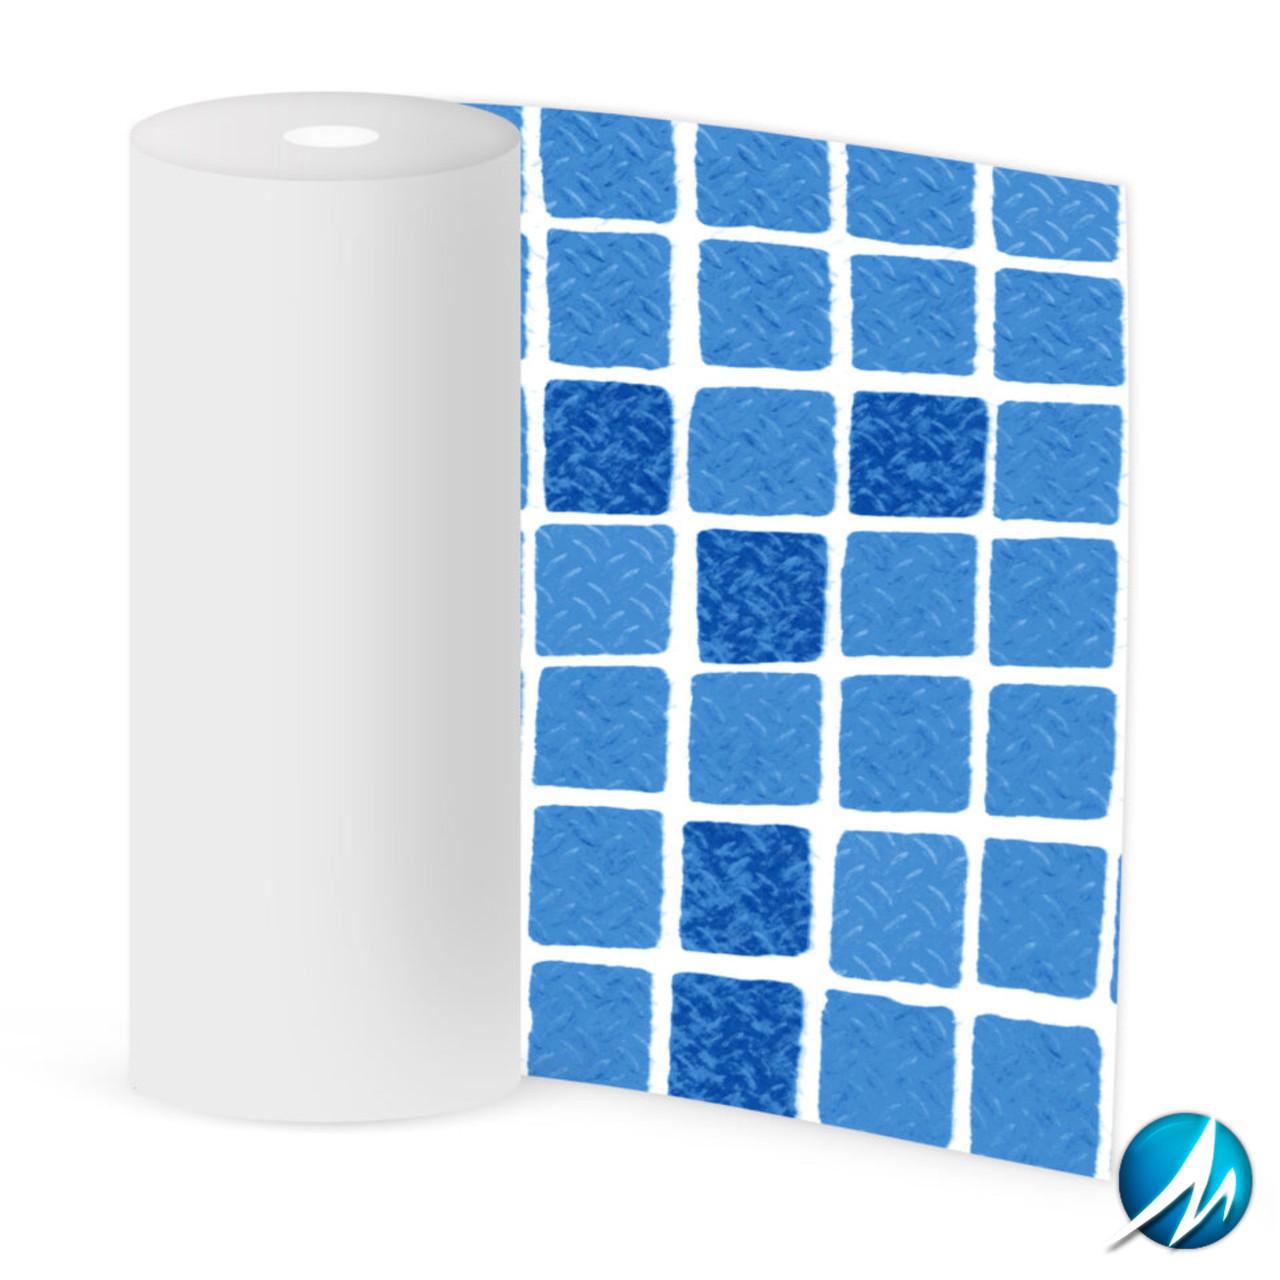 Лайнер противоскользящий ElbeBlue STG 200 Non-Slip Mosaic Blue 1123/01 - 1,65 м / 16,5 м²